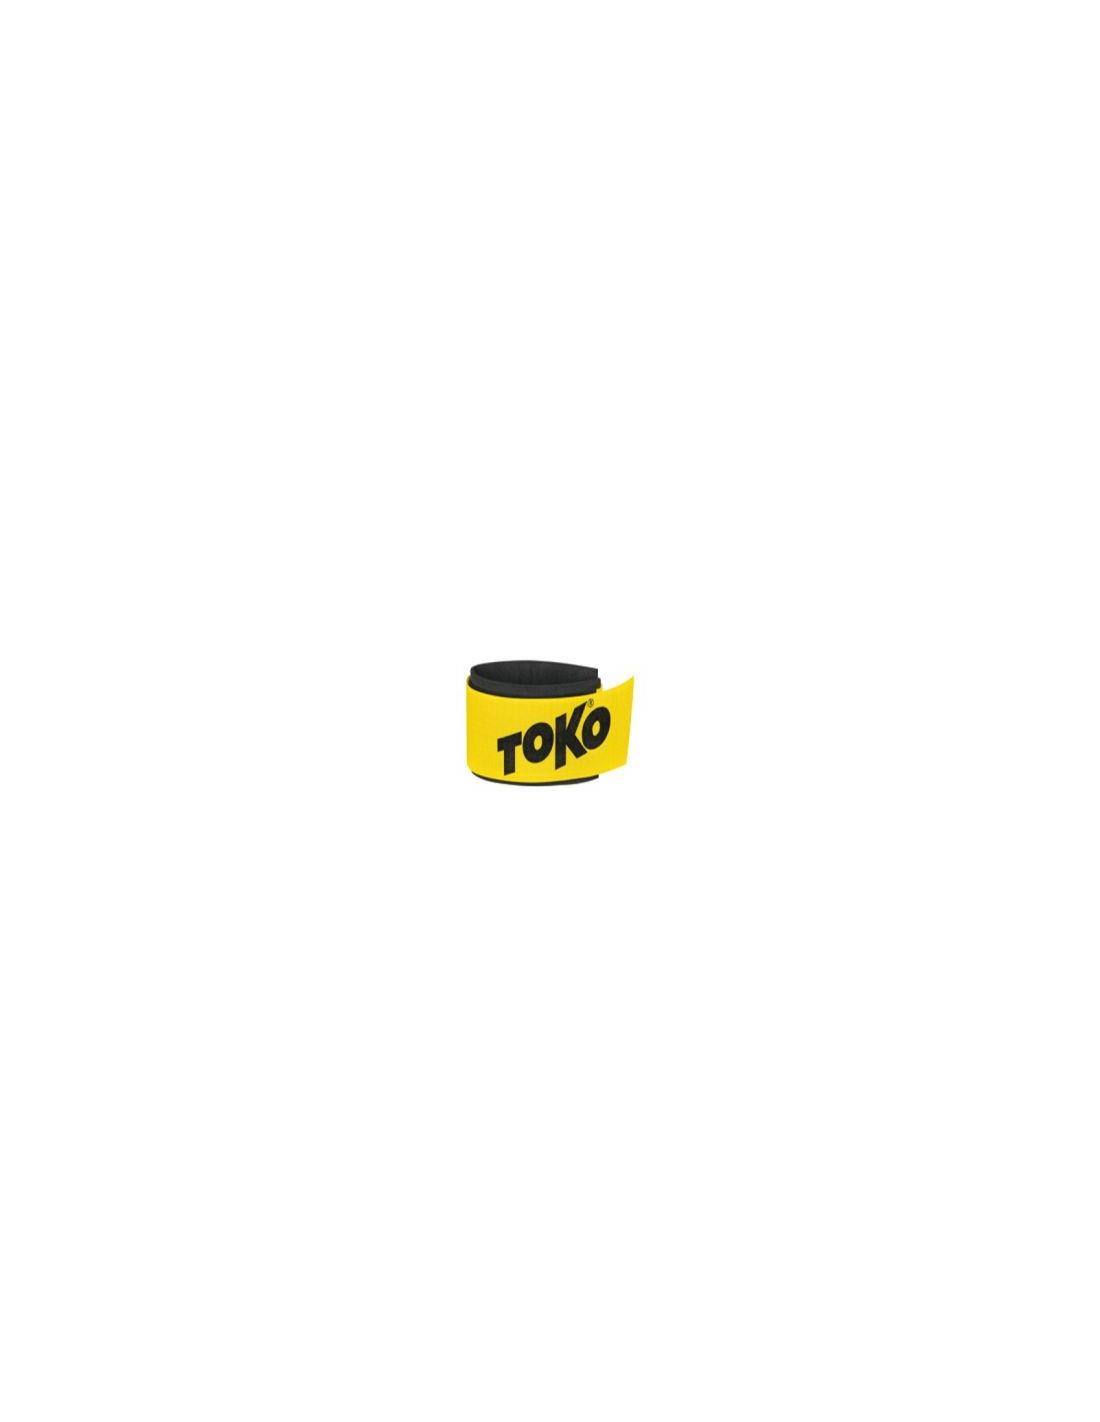 Toko Ski Clip Freeride Tools - Skiclip,